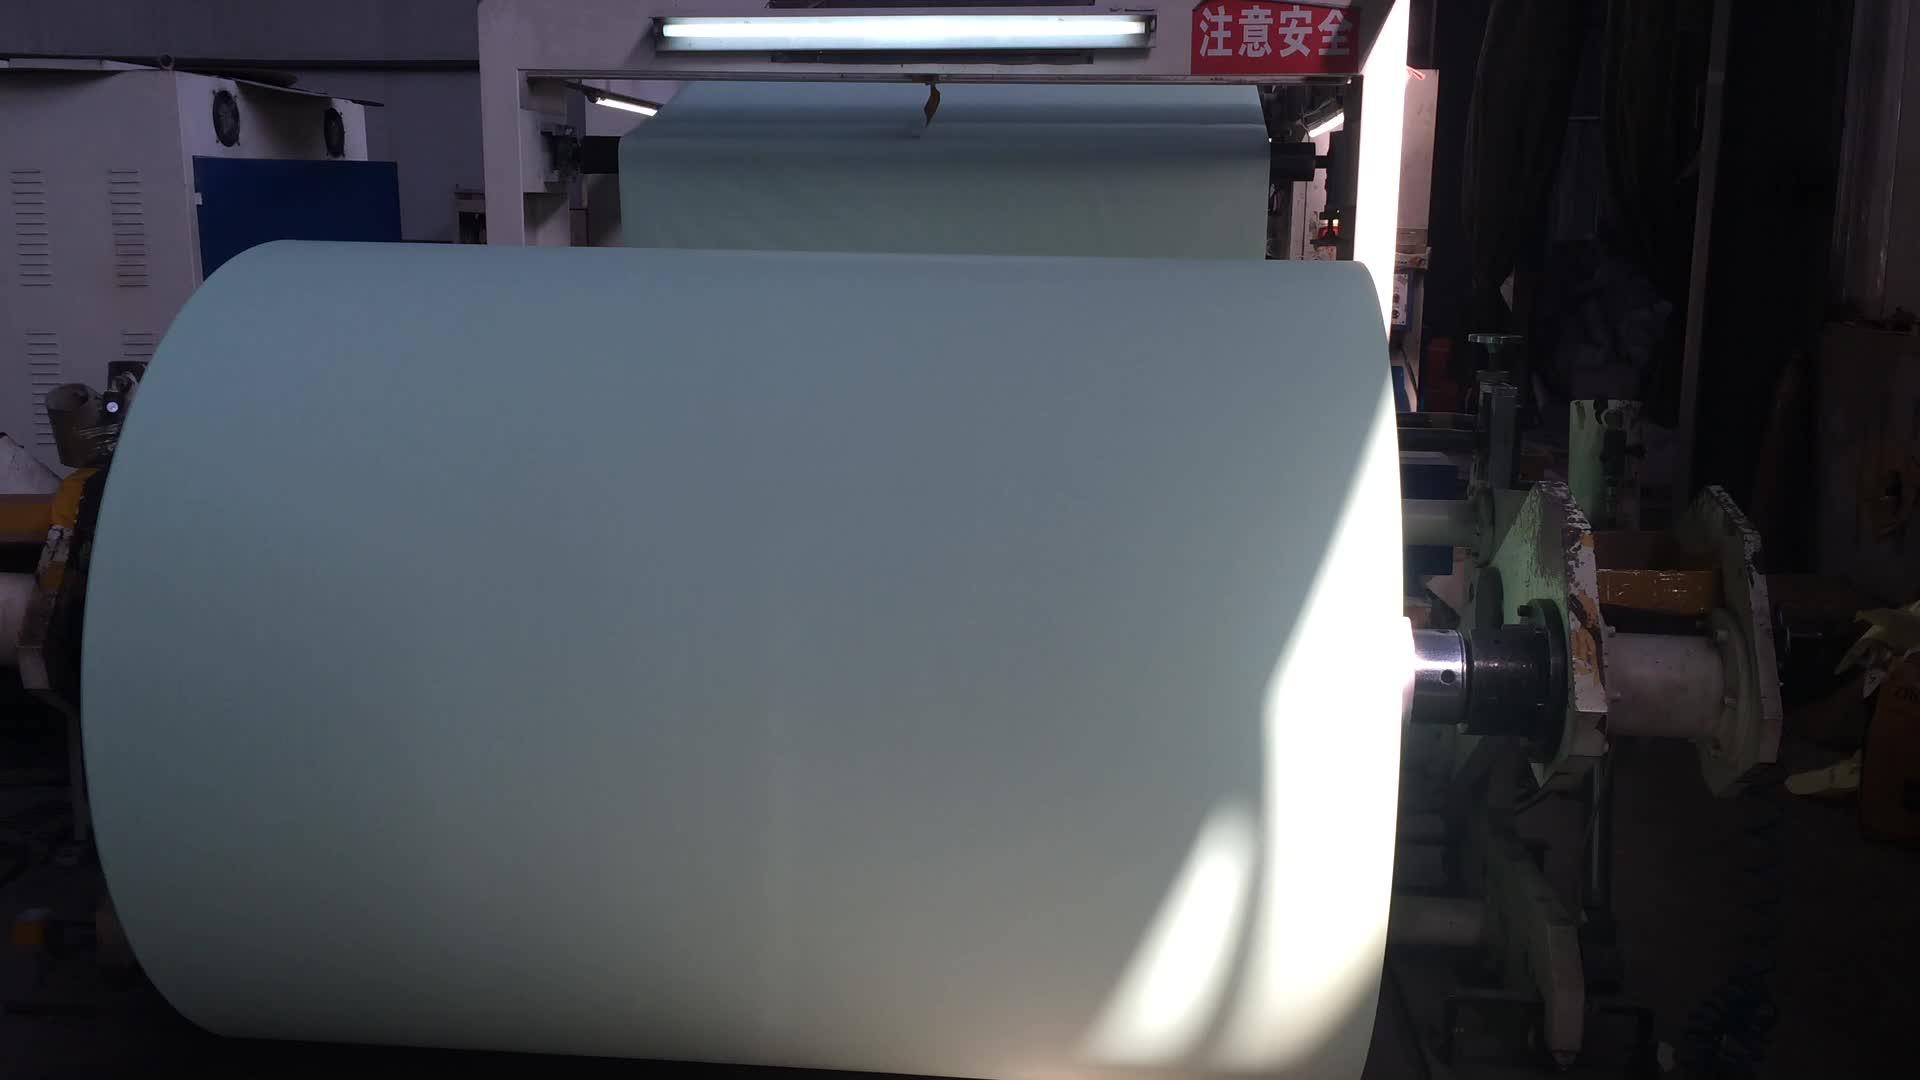 CB CFB CF סין מפעל נטול פחם נייר, נייר נטול פחם לחמניות